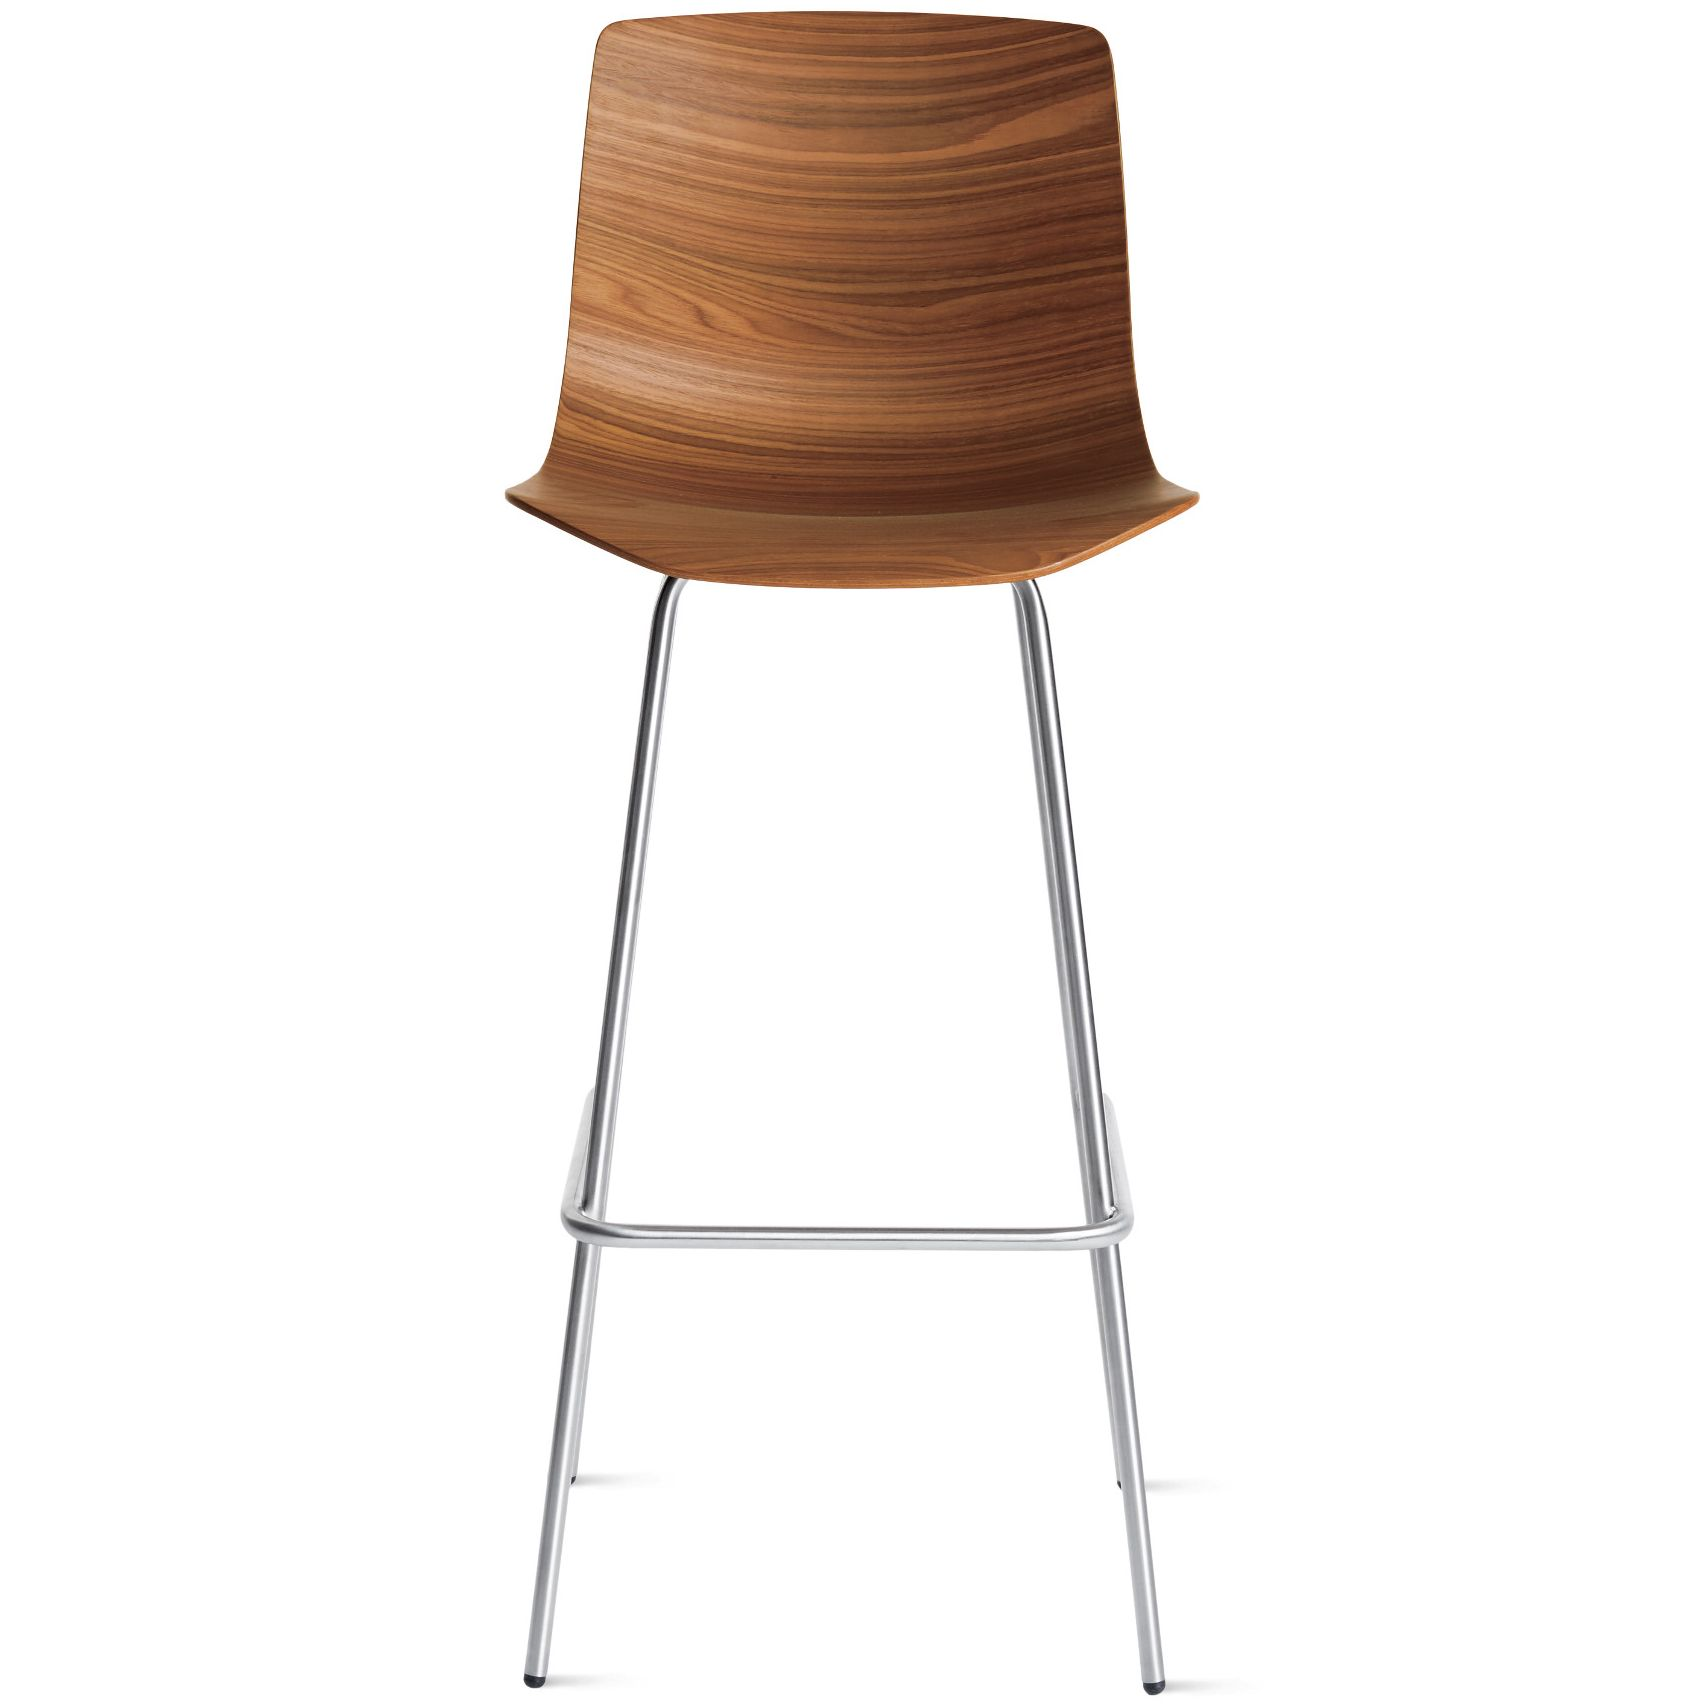 Loku bar stool